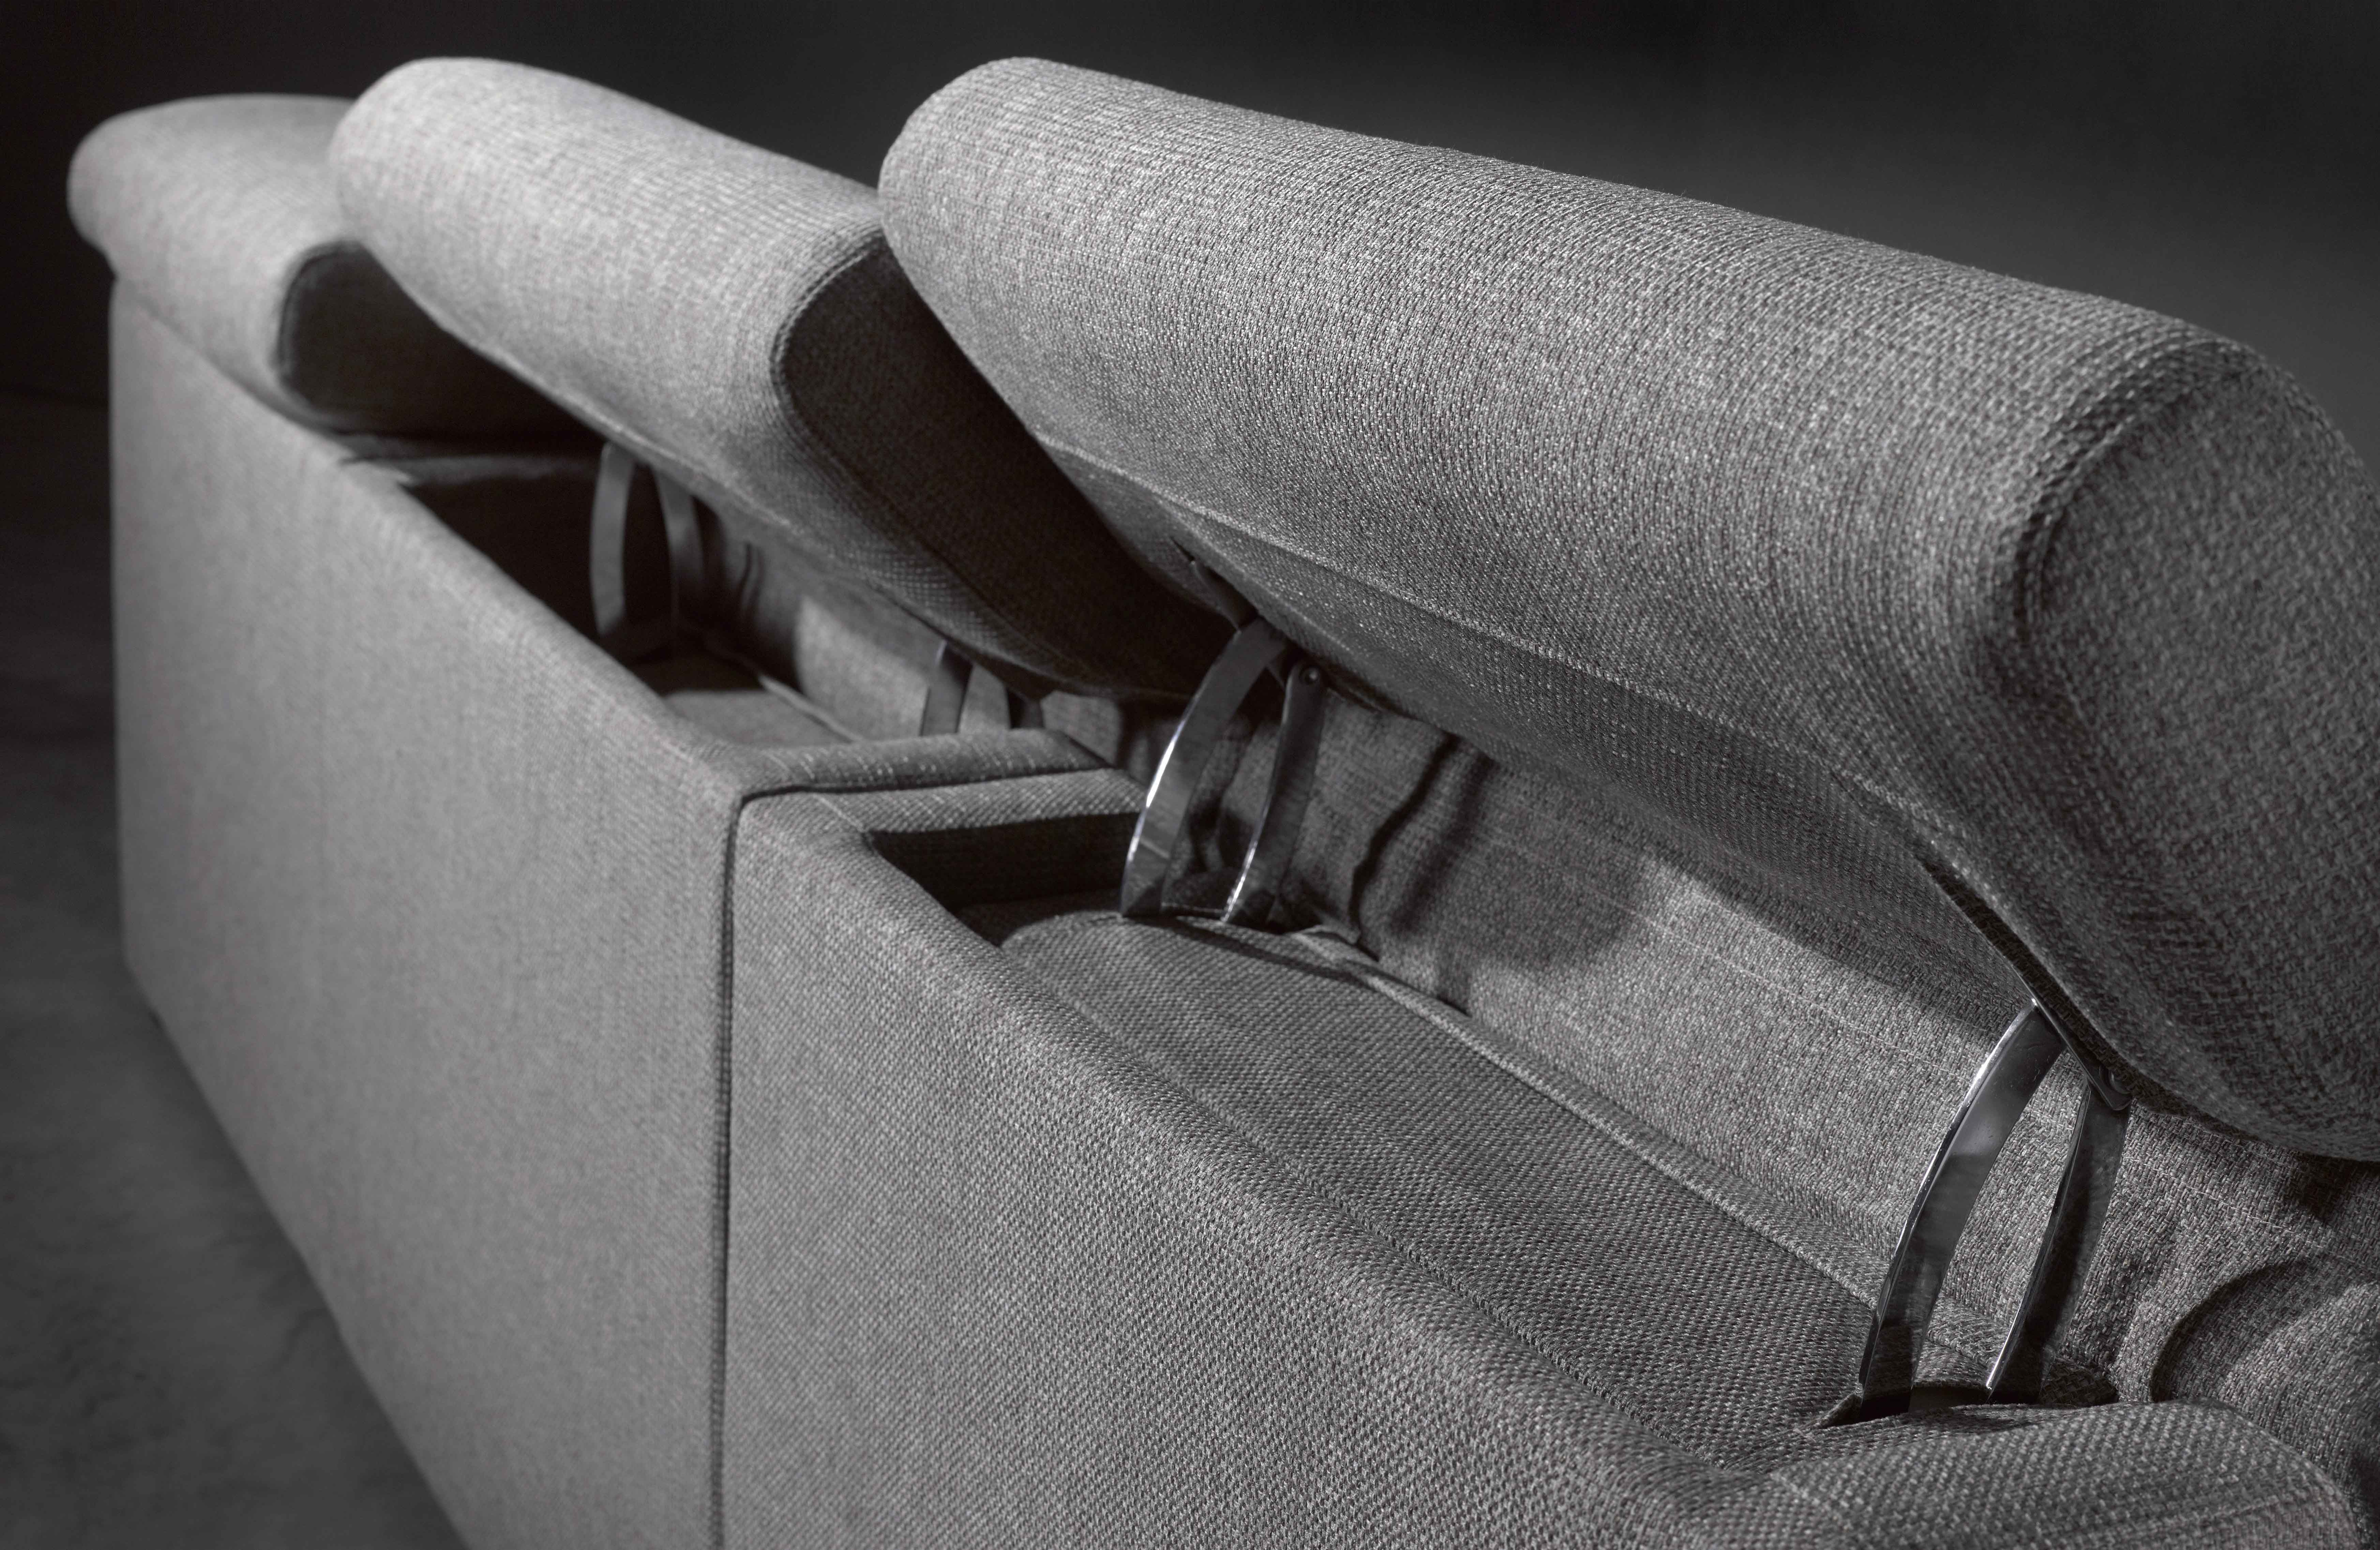 home cinema installation  home cinema design  home cinema sofa  home cinema  furniture. Luxury Home Cinema Seating  Home Cinema Installation   Home Cinema